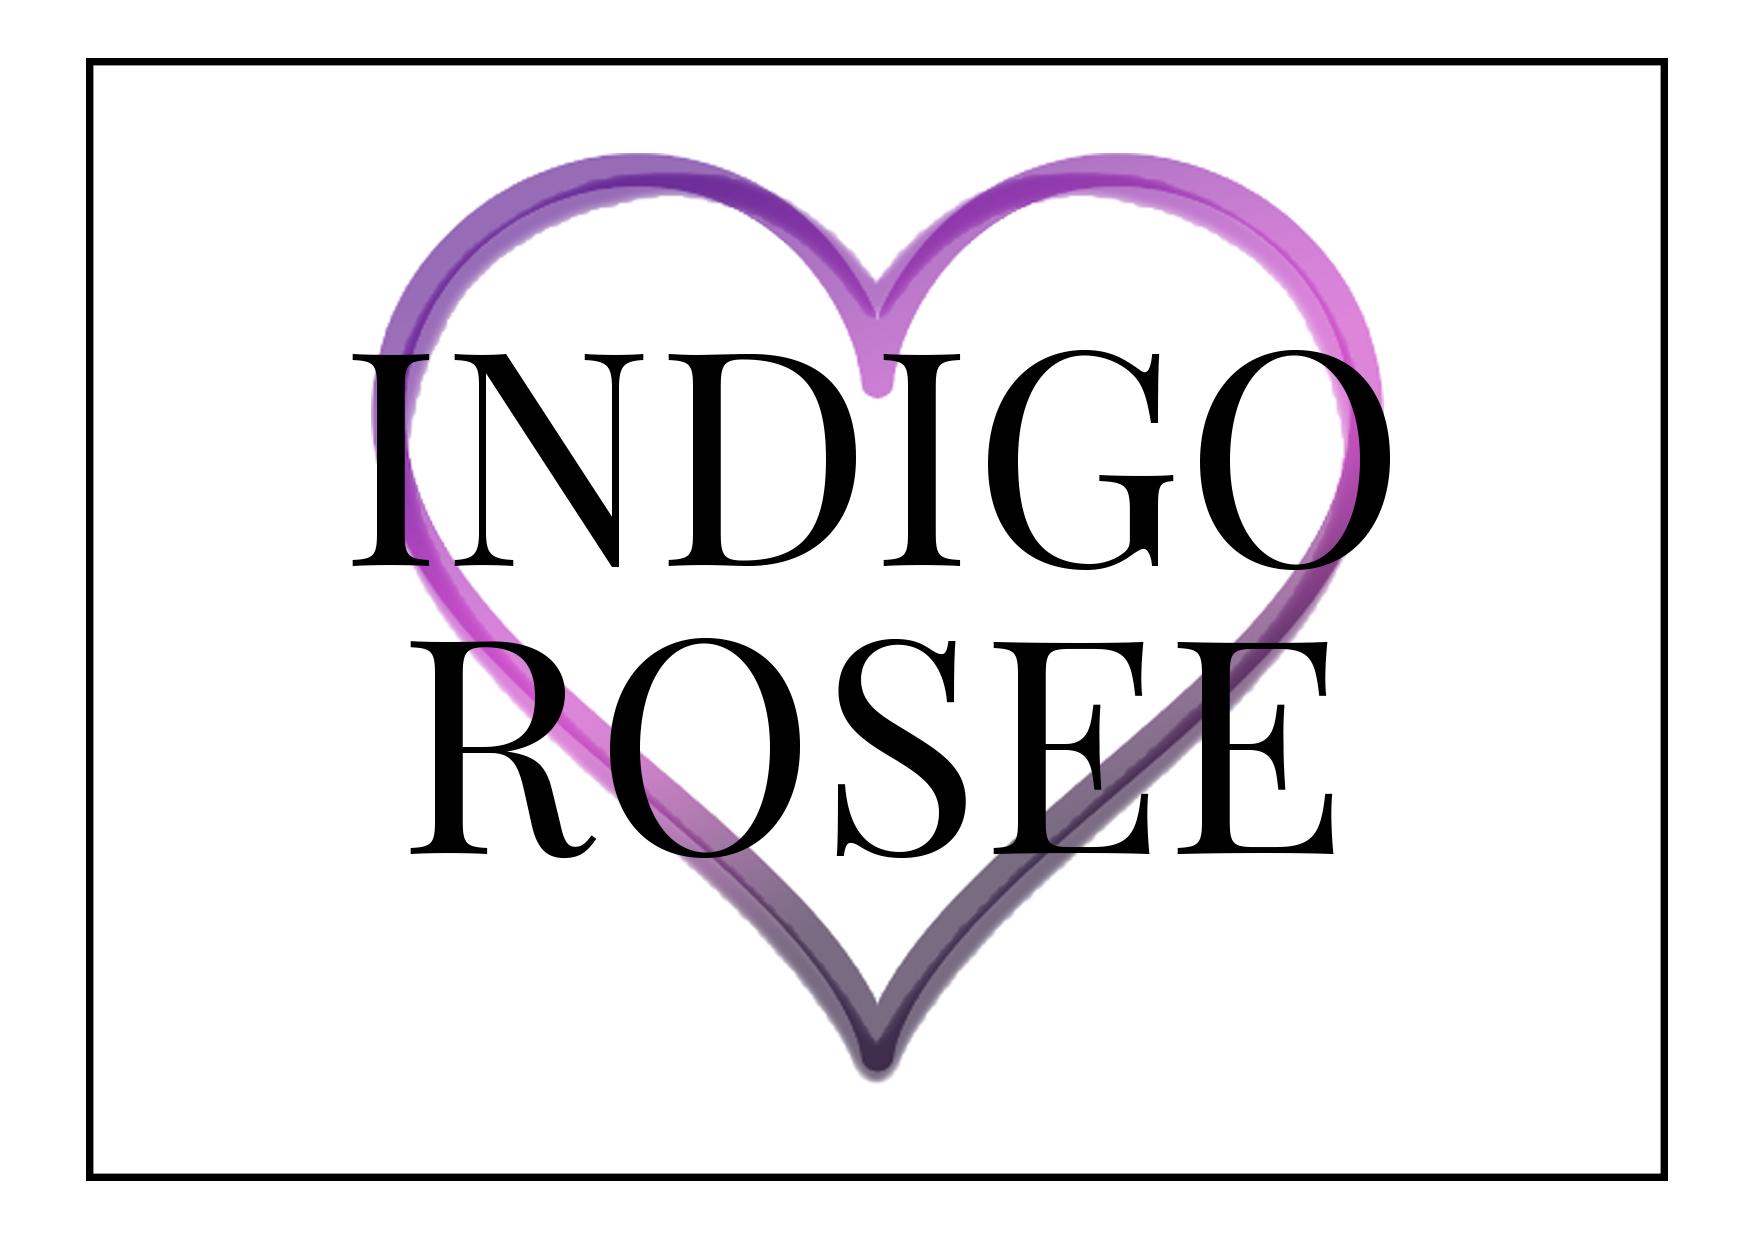 Indigo Rosee